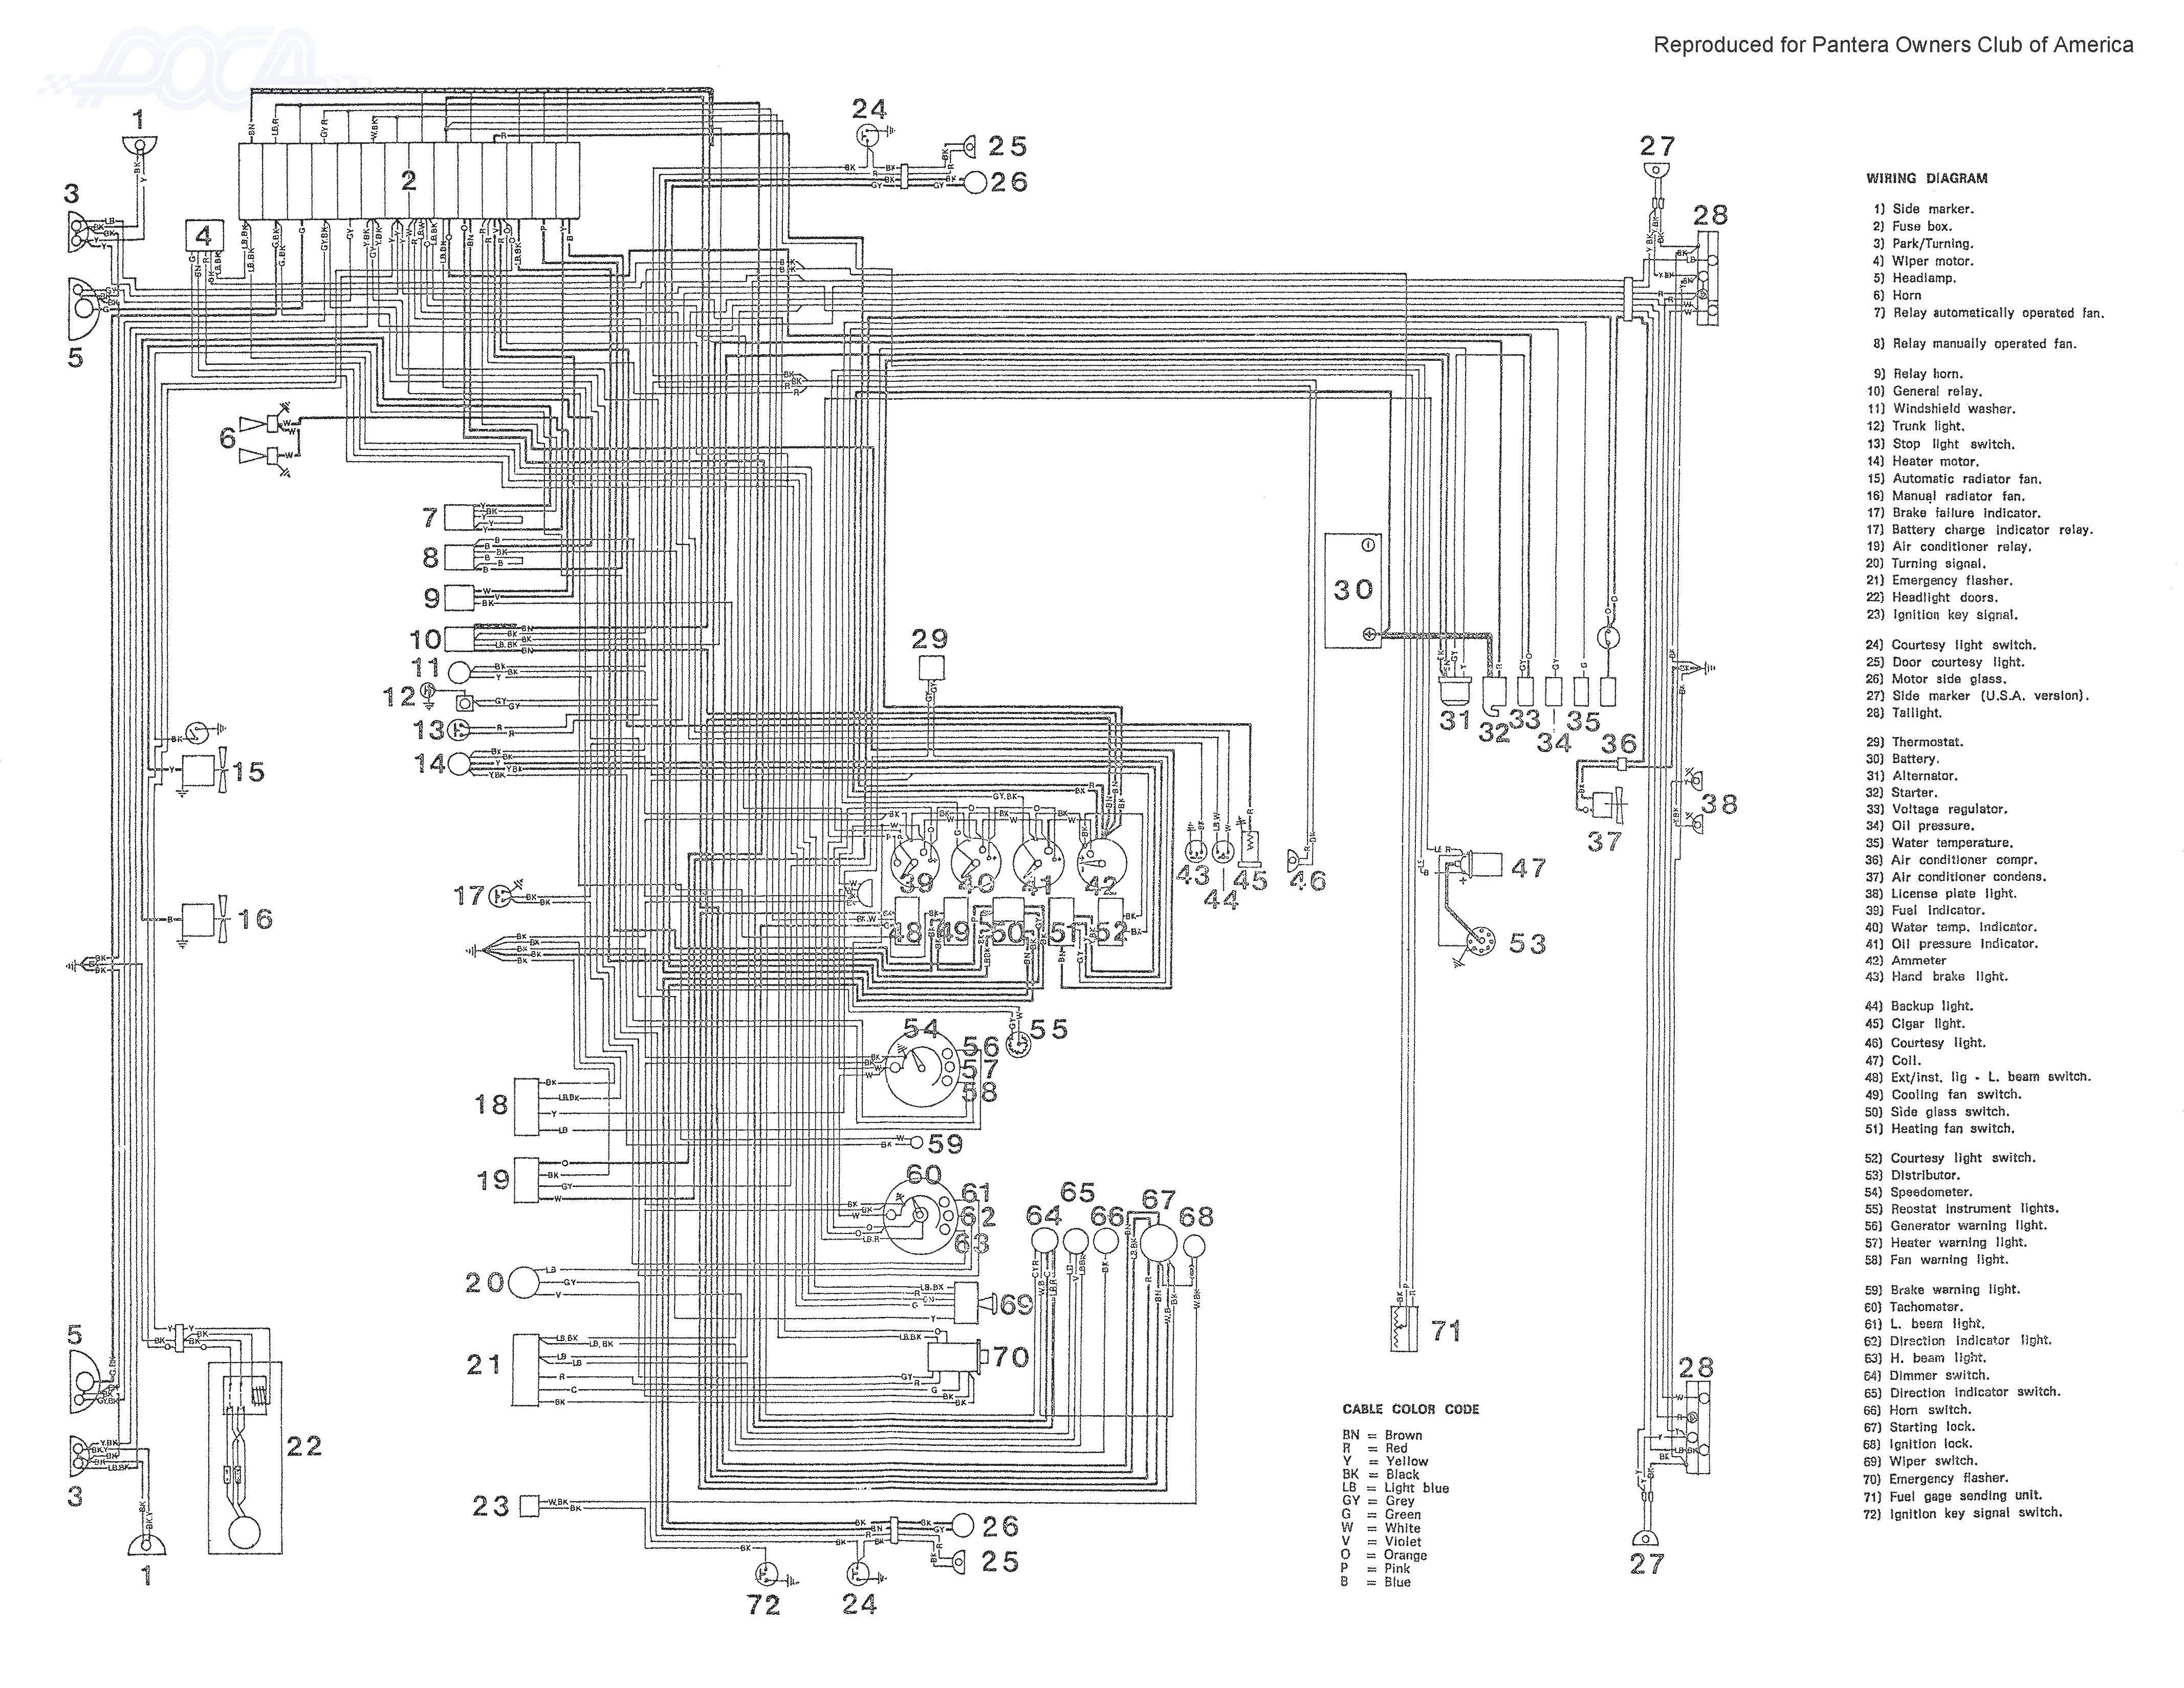 Unique 1997 International 4700 Wiring Diagram In 2020 Diagram Car Alternator International